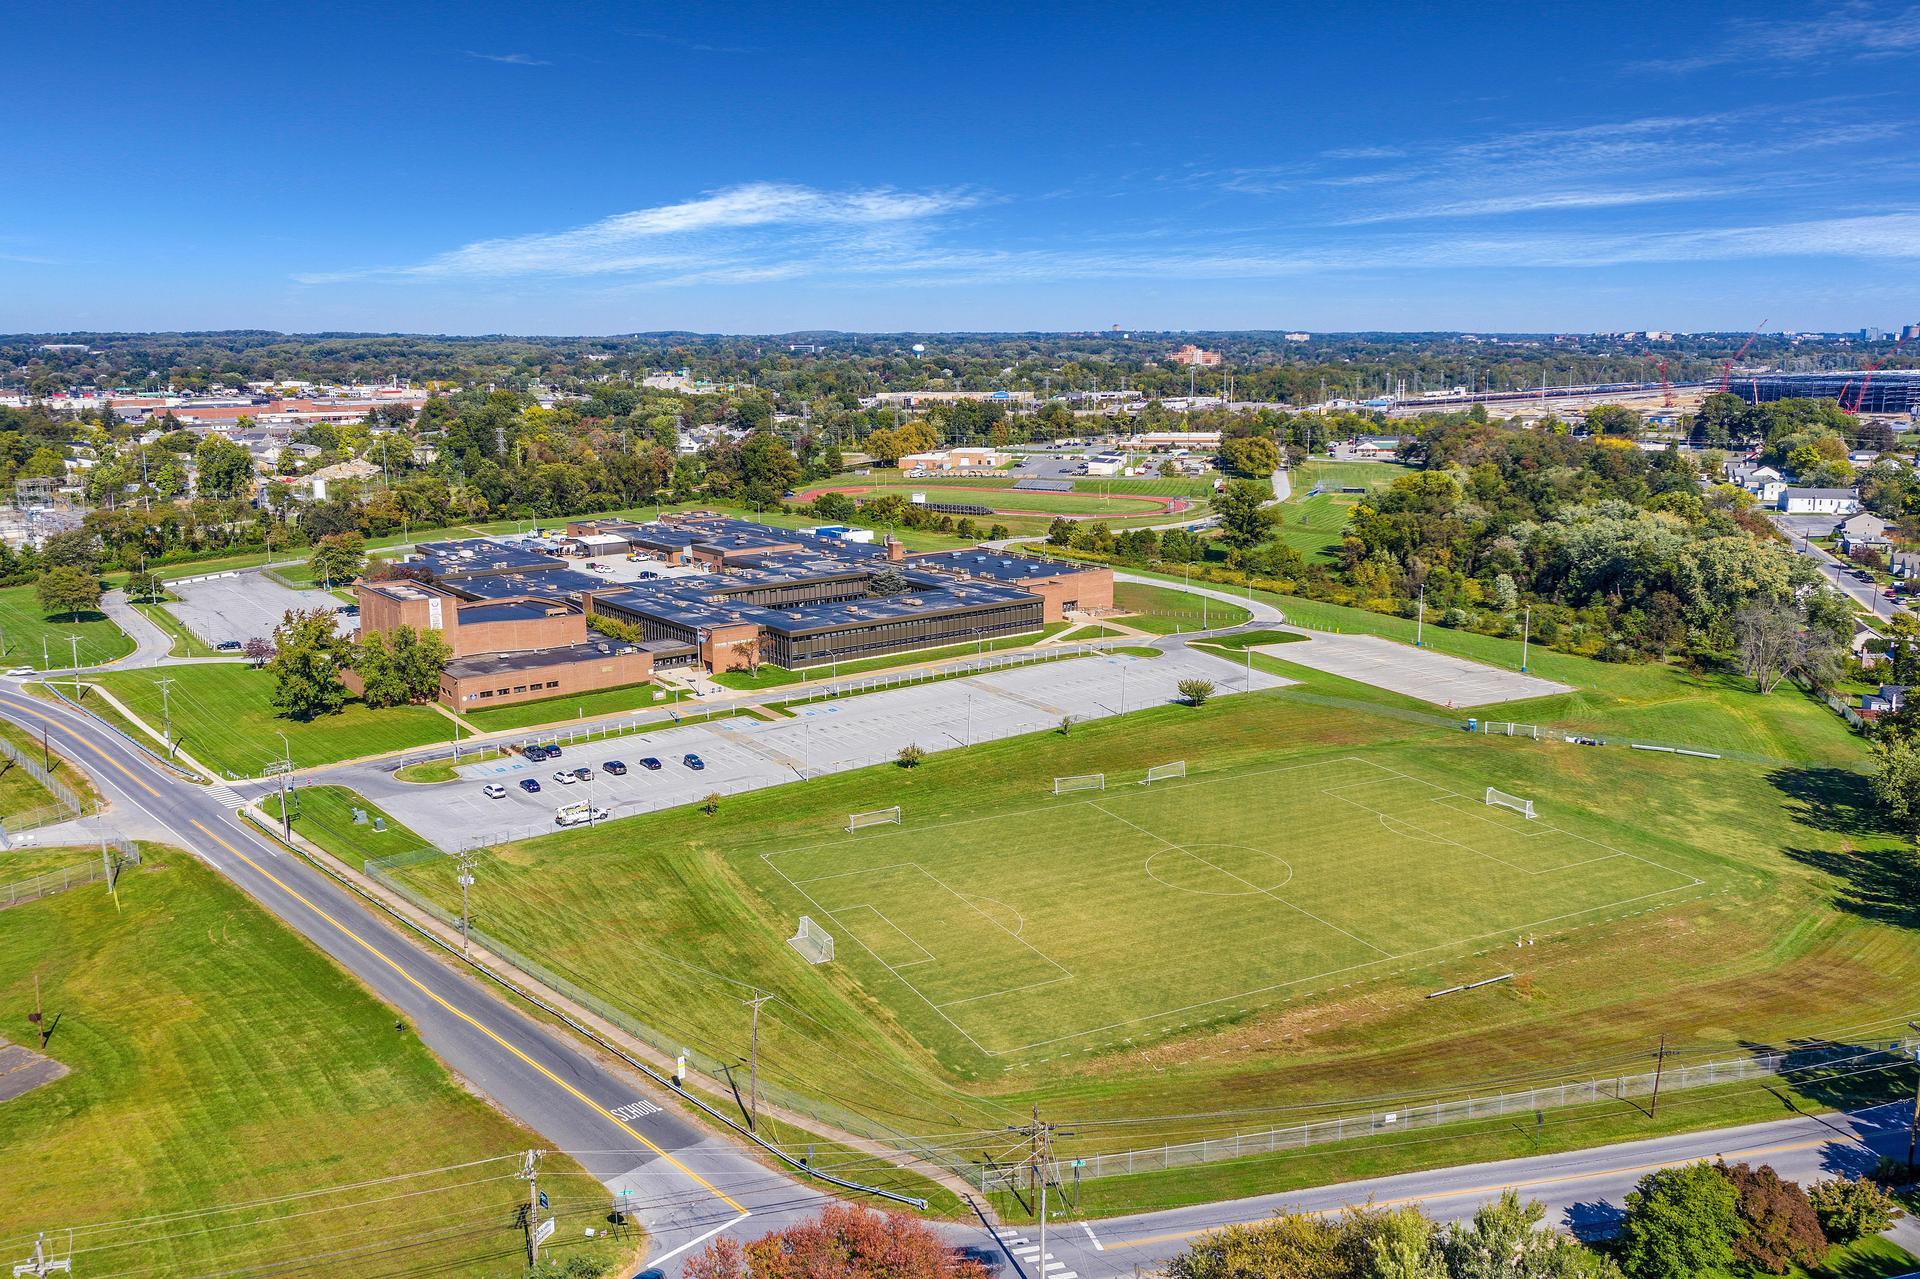 Drone View of Delcastle School